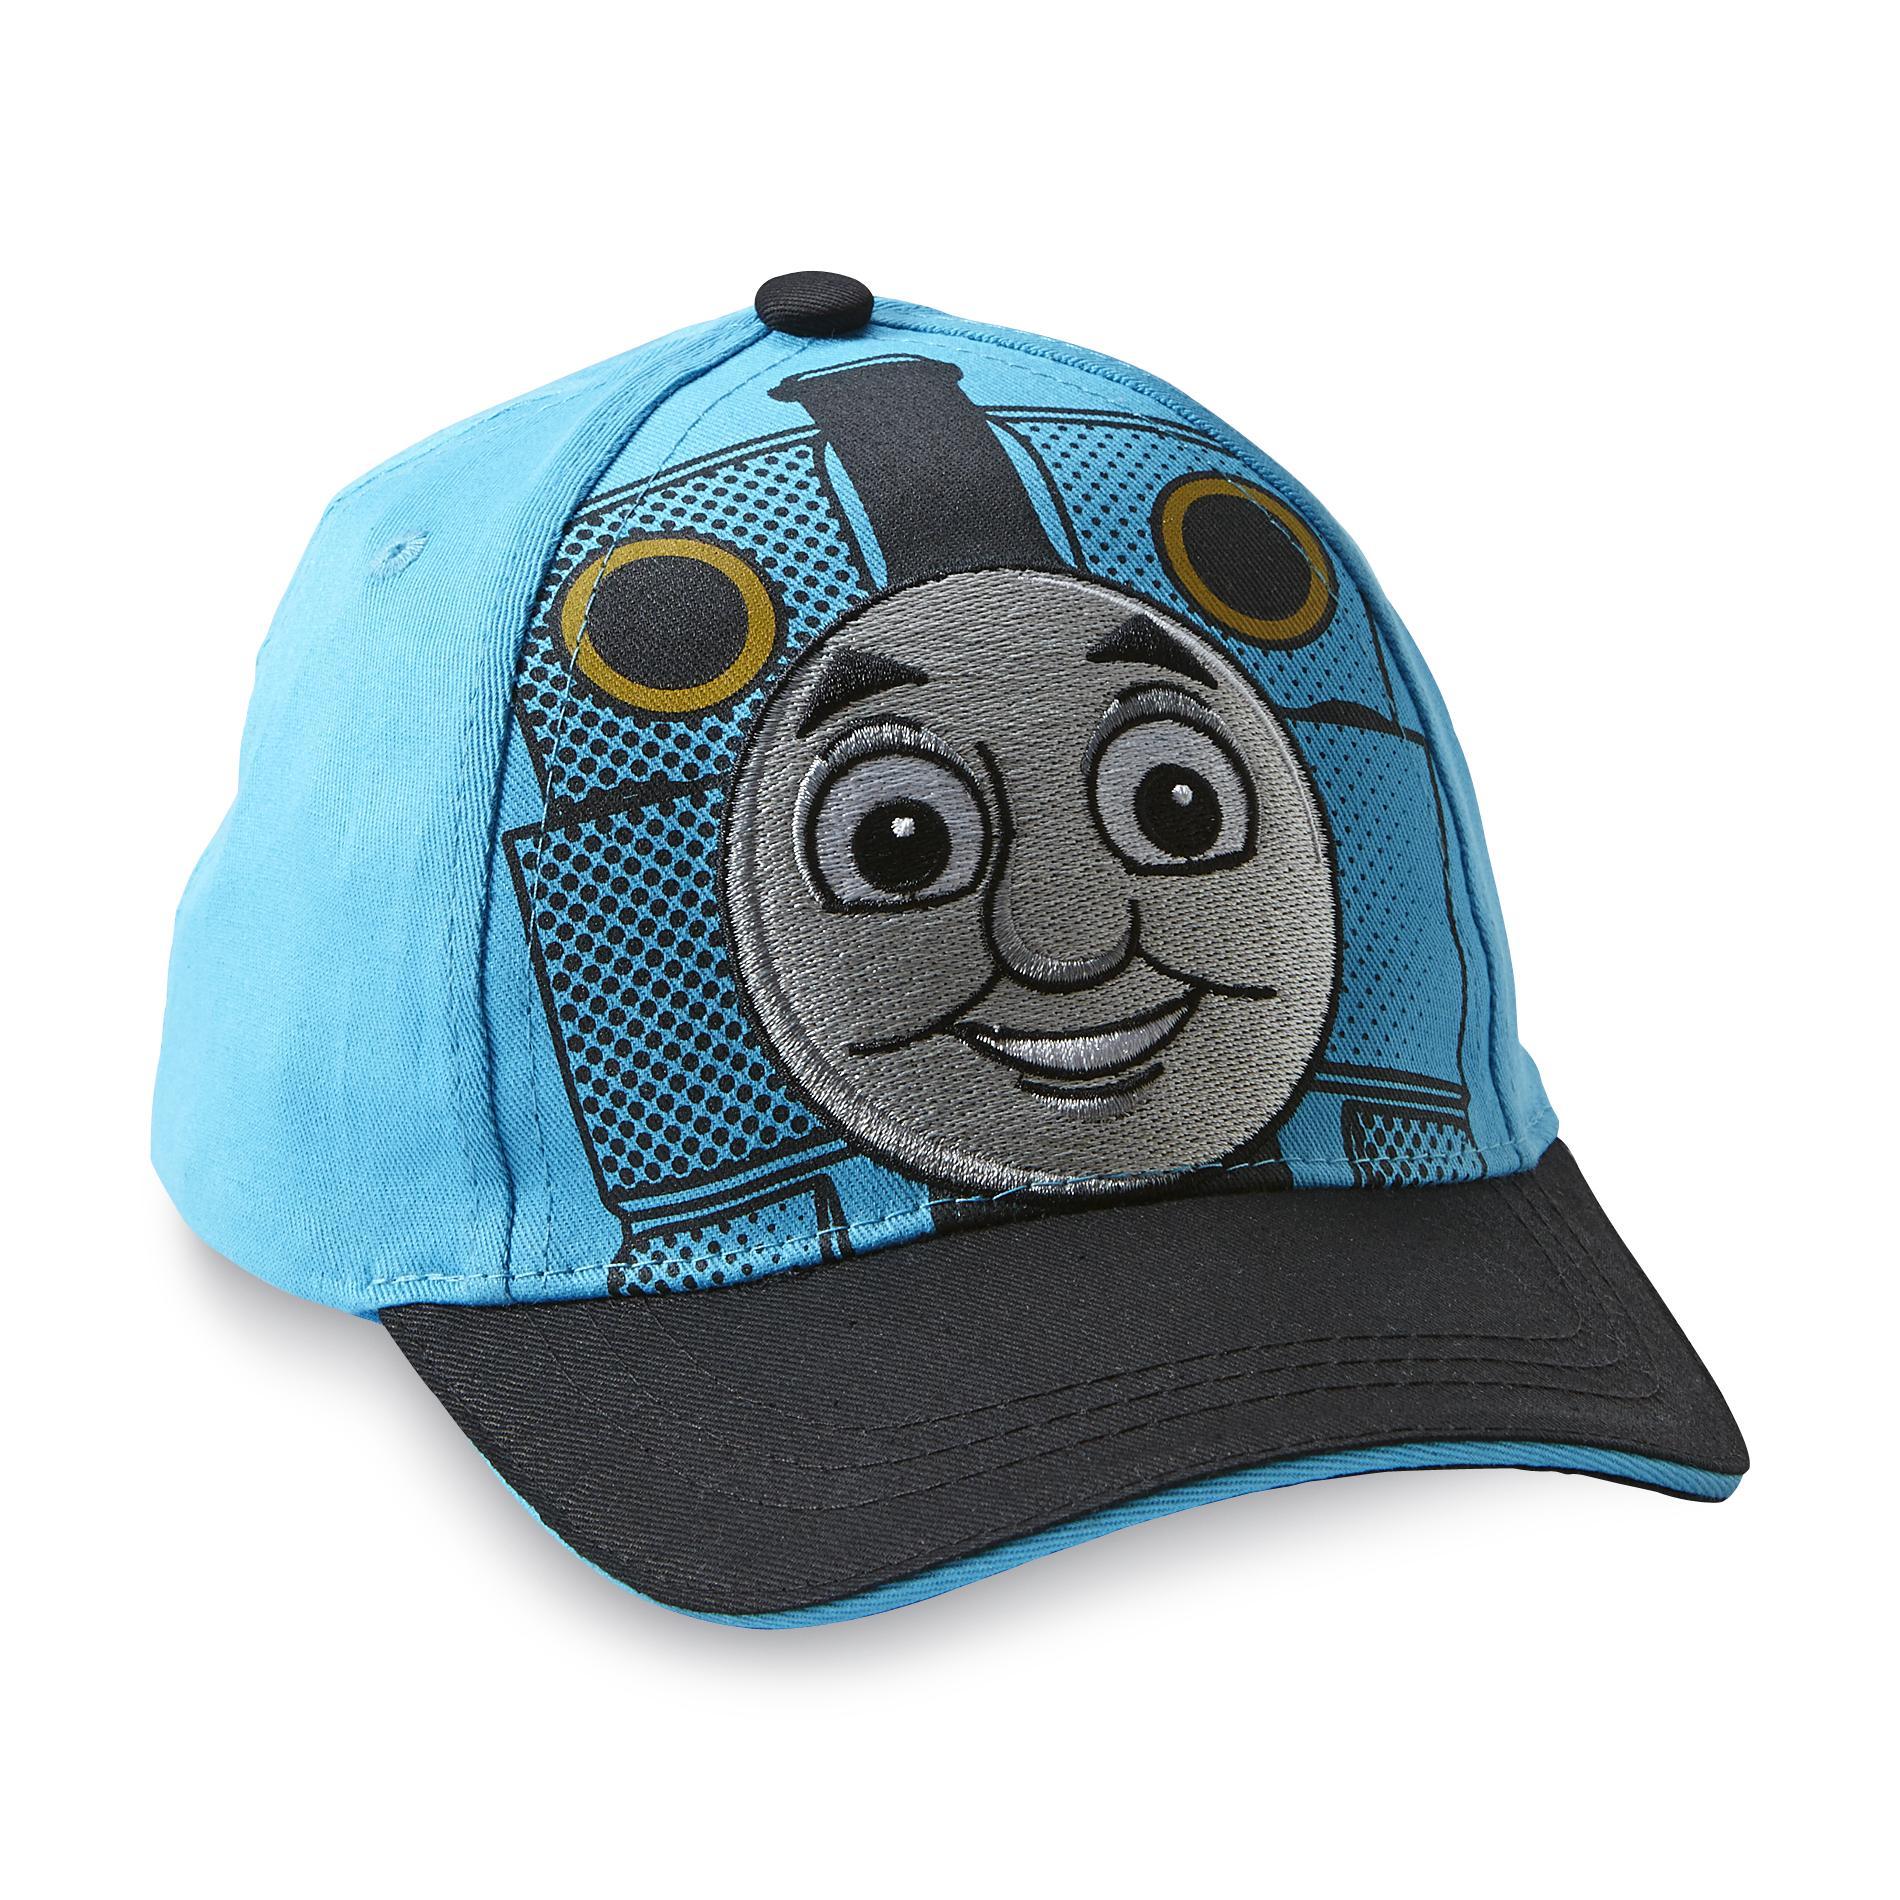 Nickelodeon Thomas & Friends Infant Boy's Baseball Cap